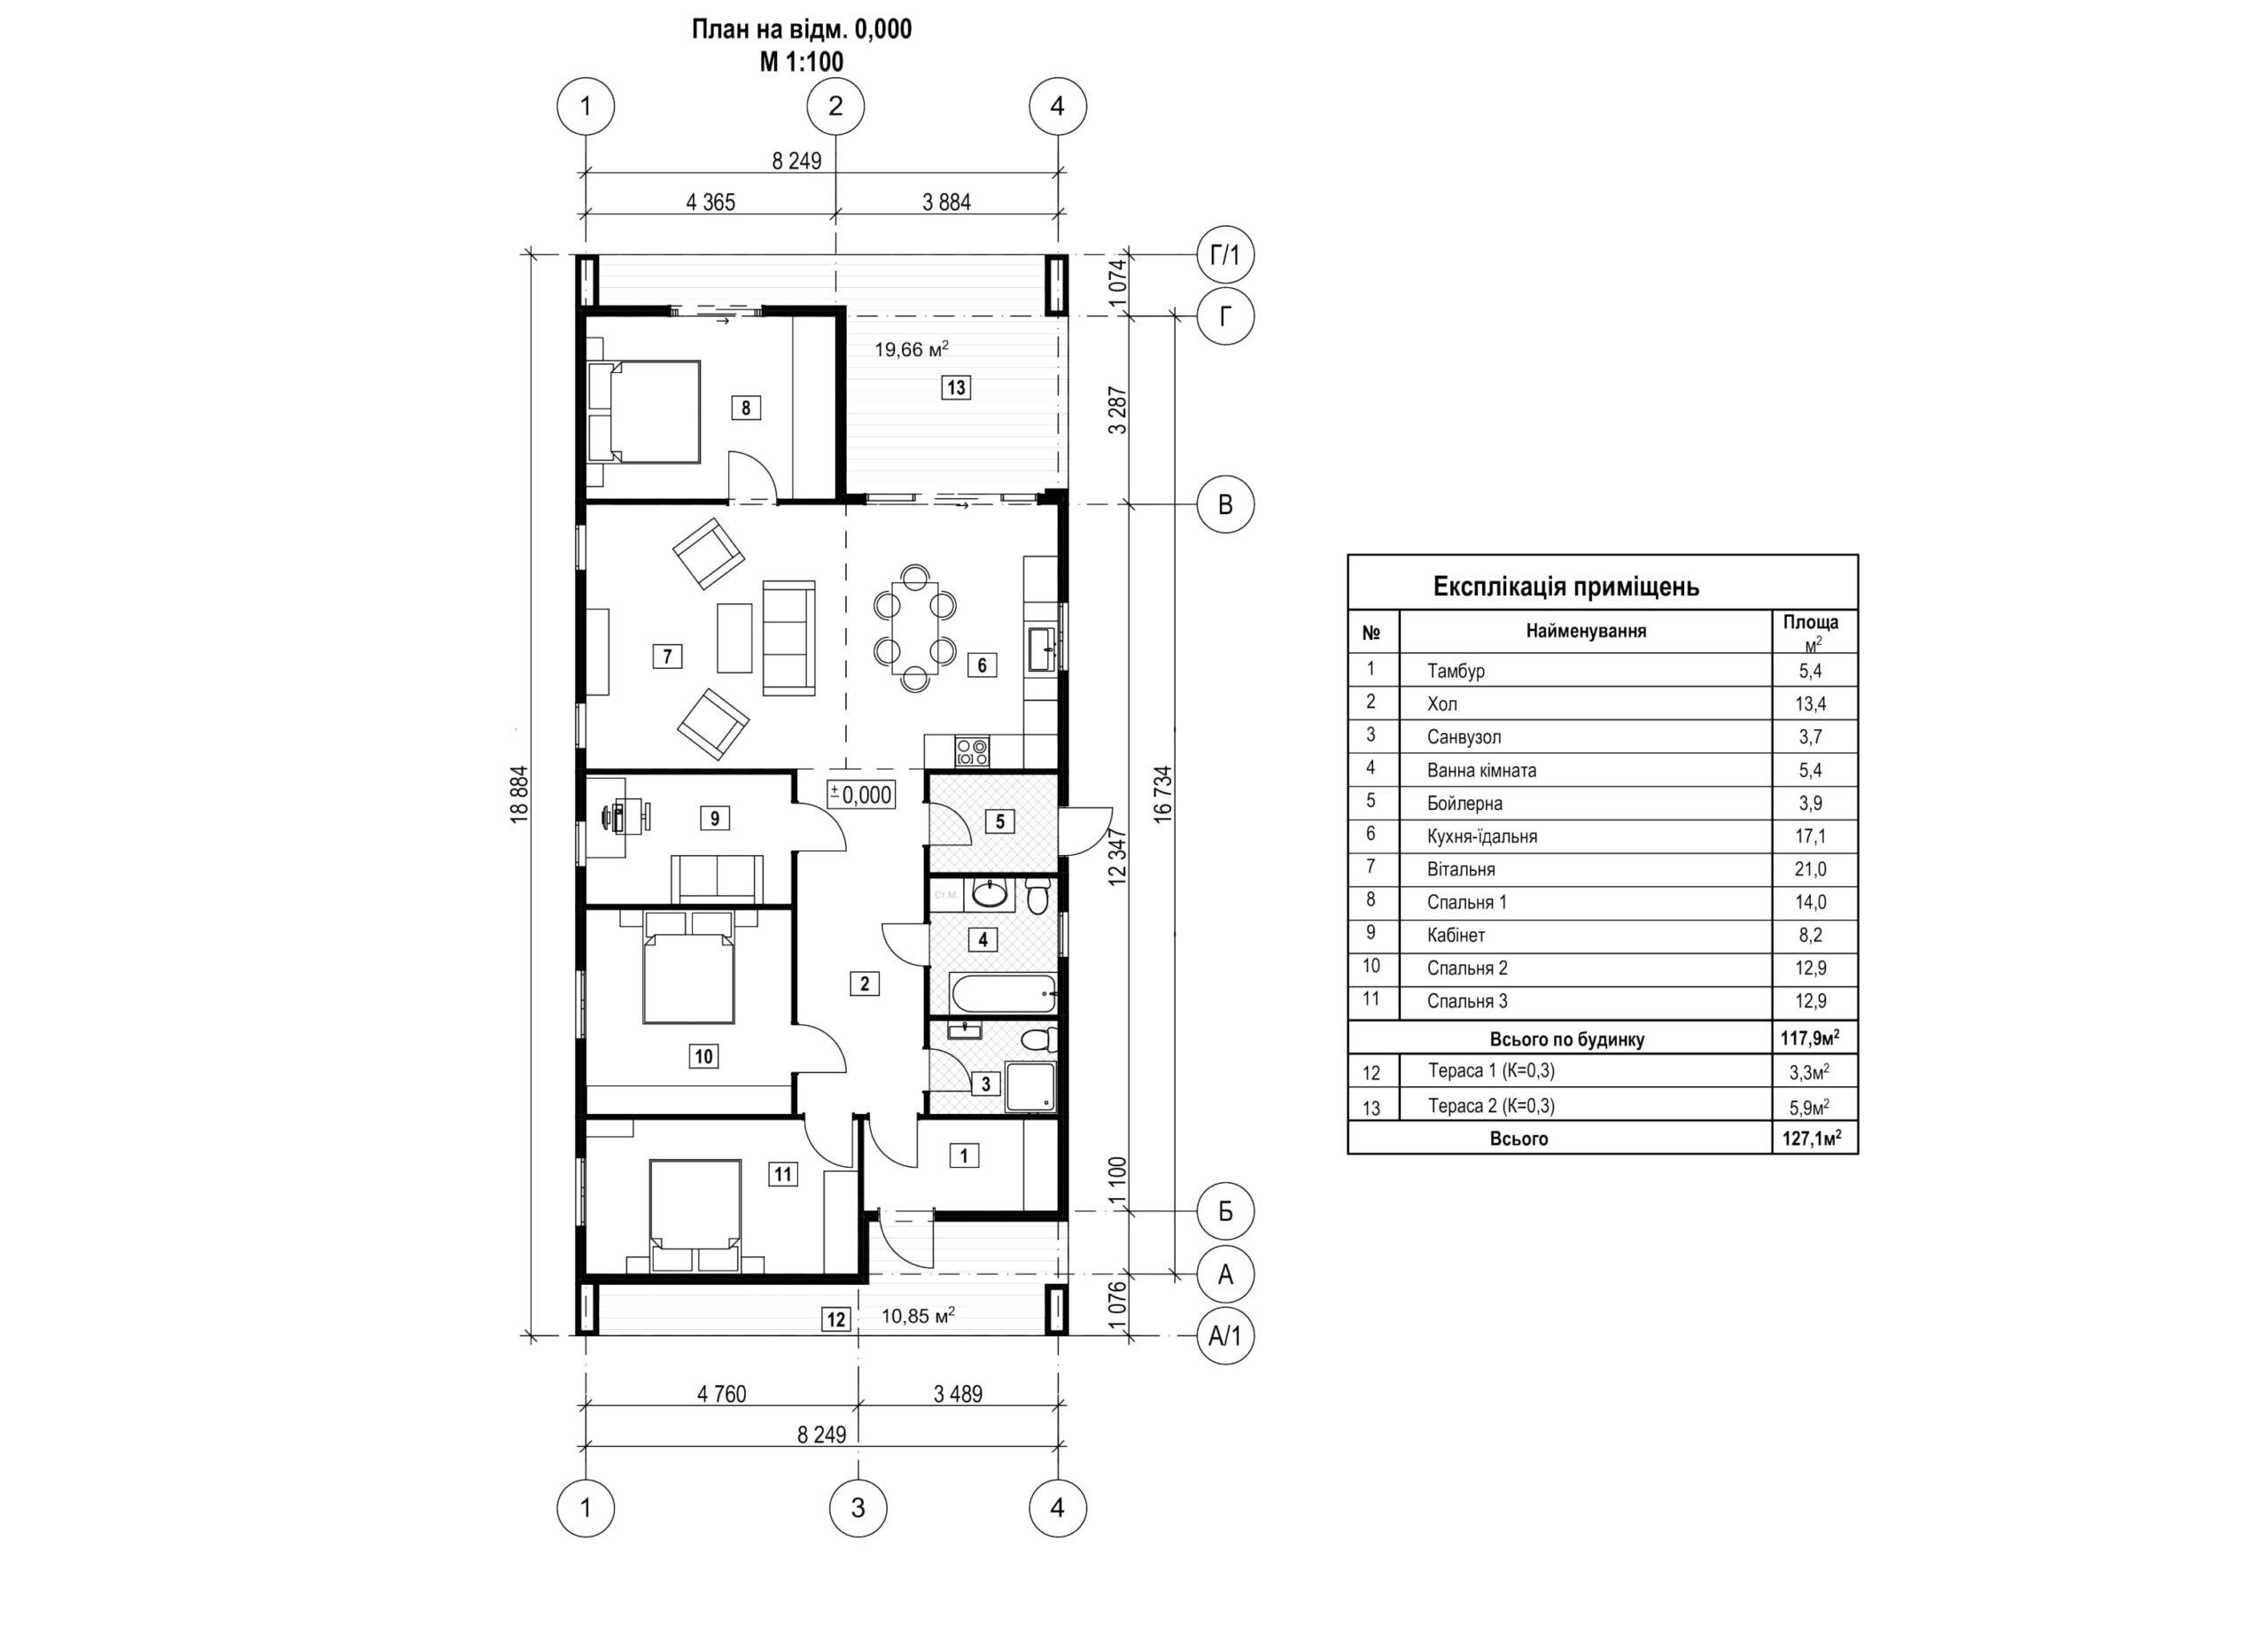 Будівництво житлового 1-поверхового будинку с. Мощун Київська обл., 130 м.кв